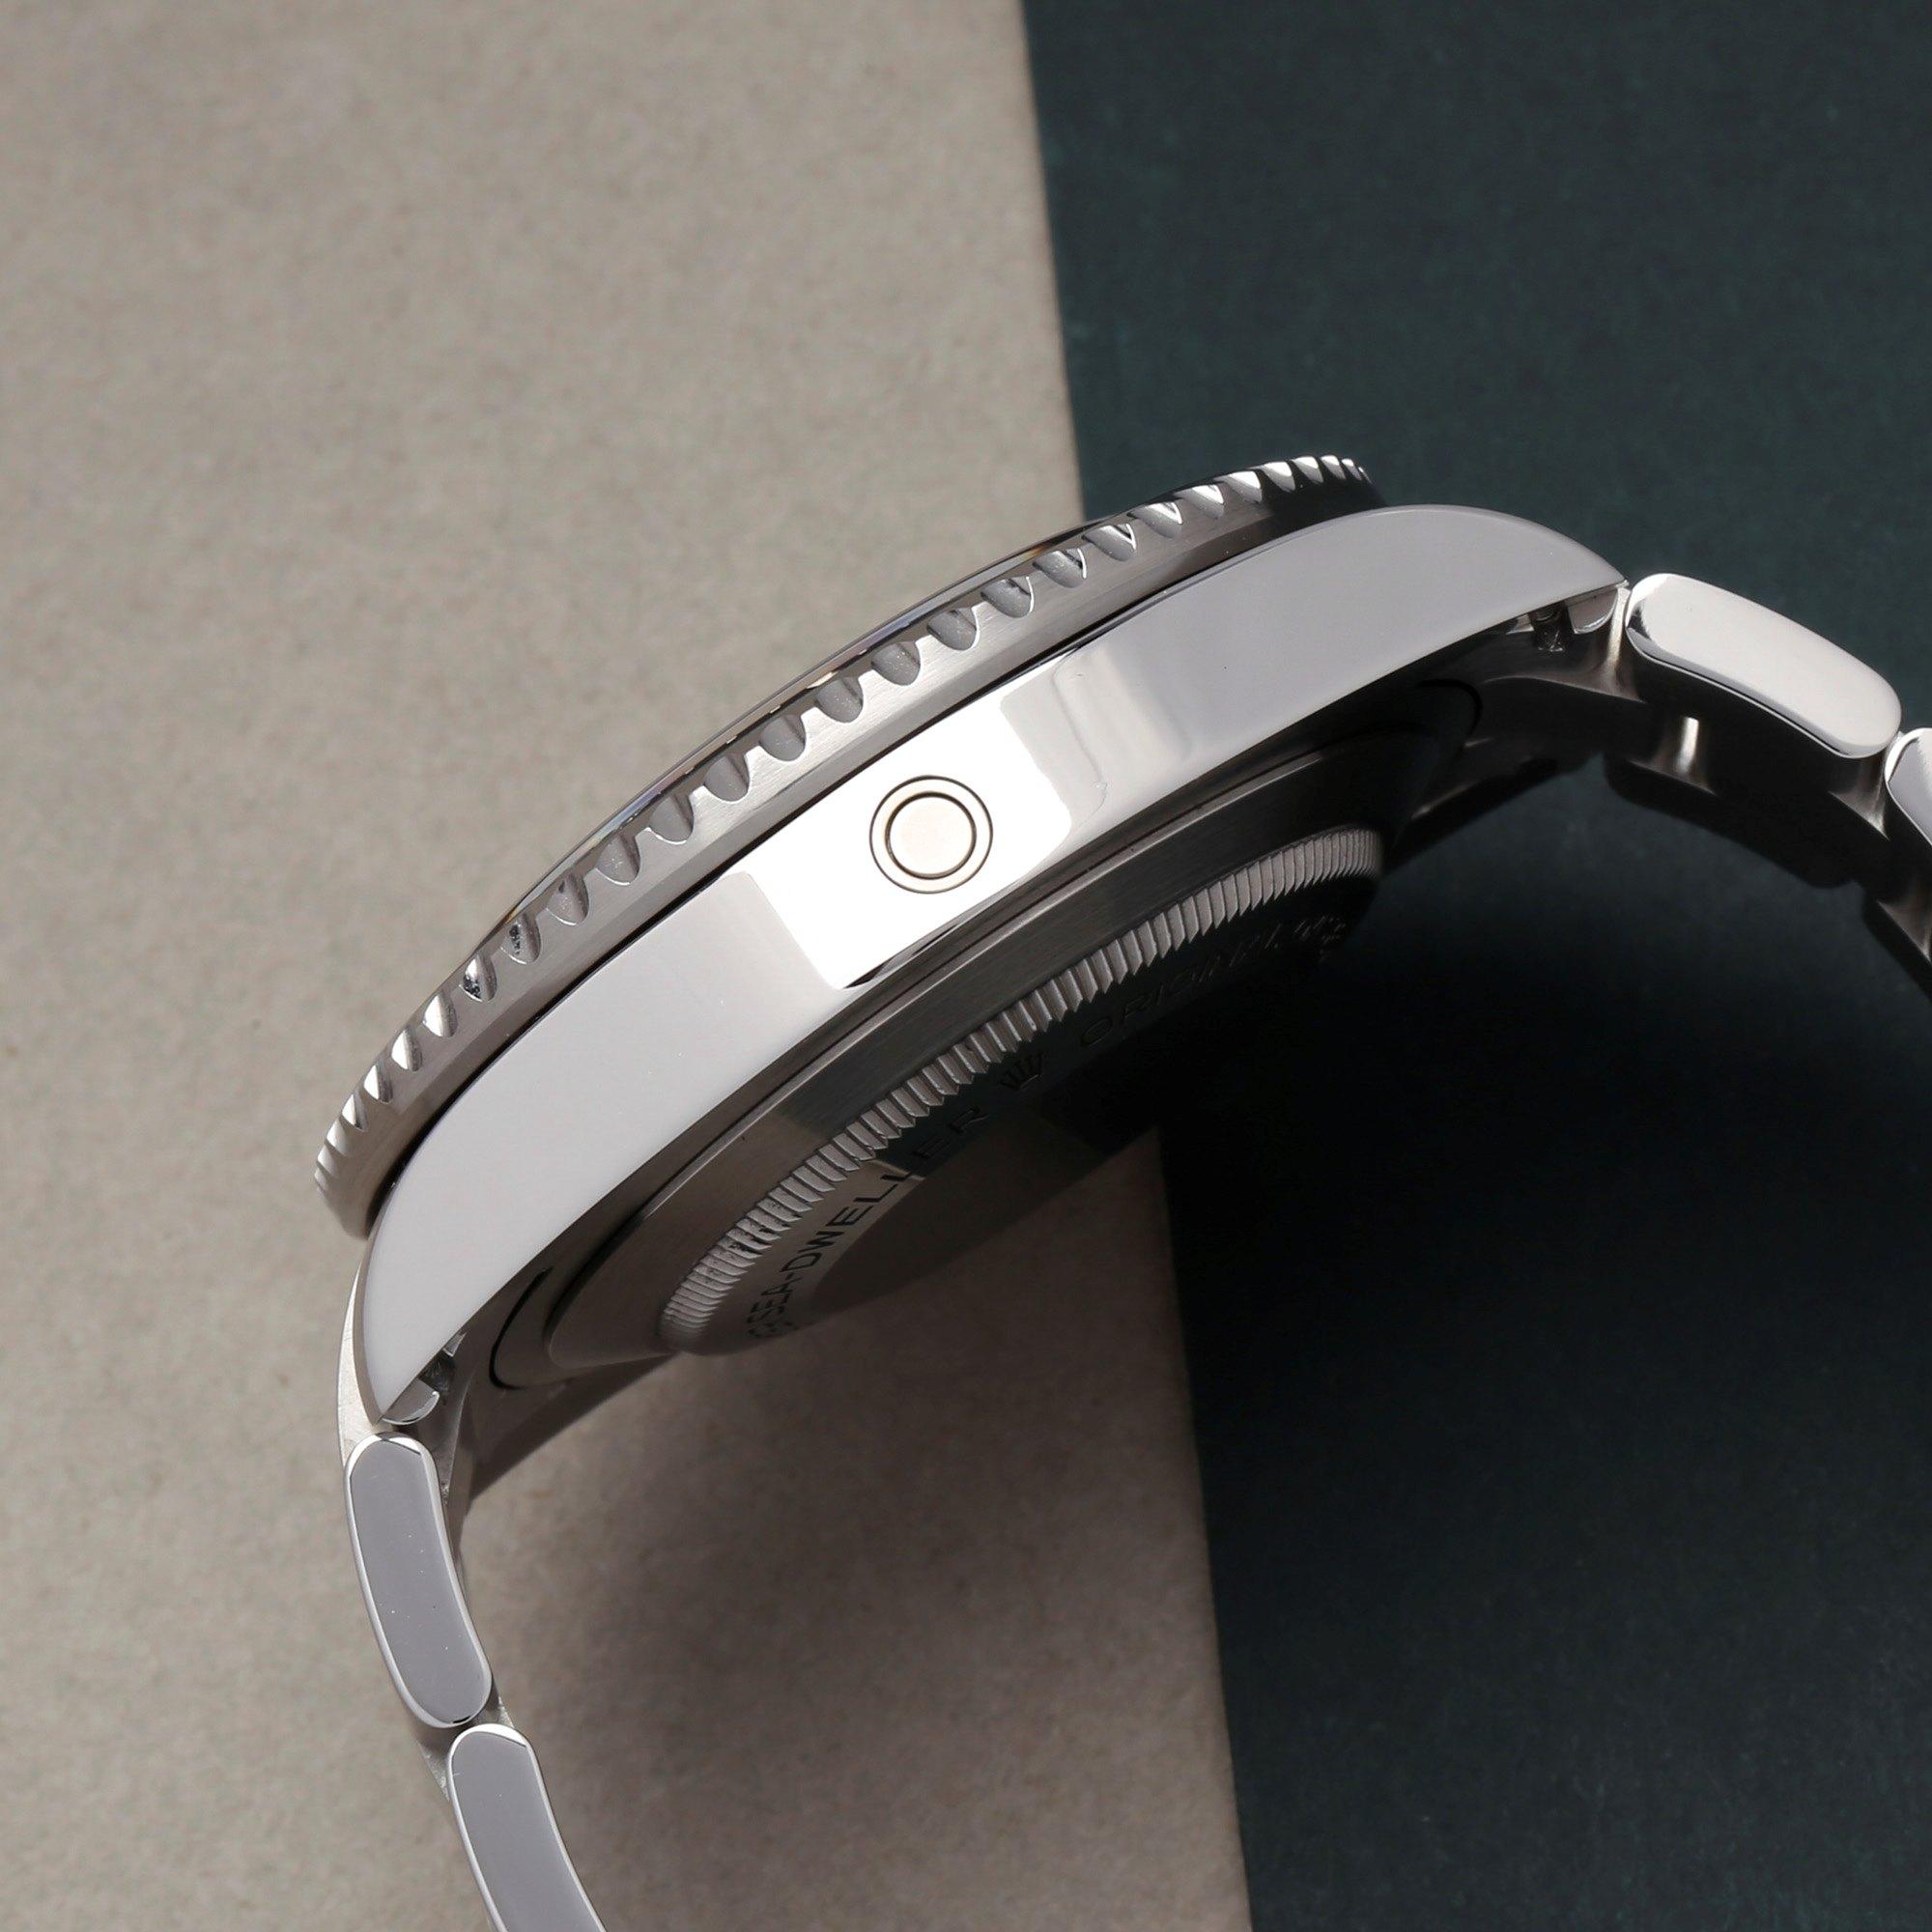 Rolex Sea-Dweller 50th anniversary Stainless Steel 126600